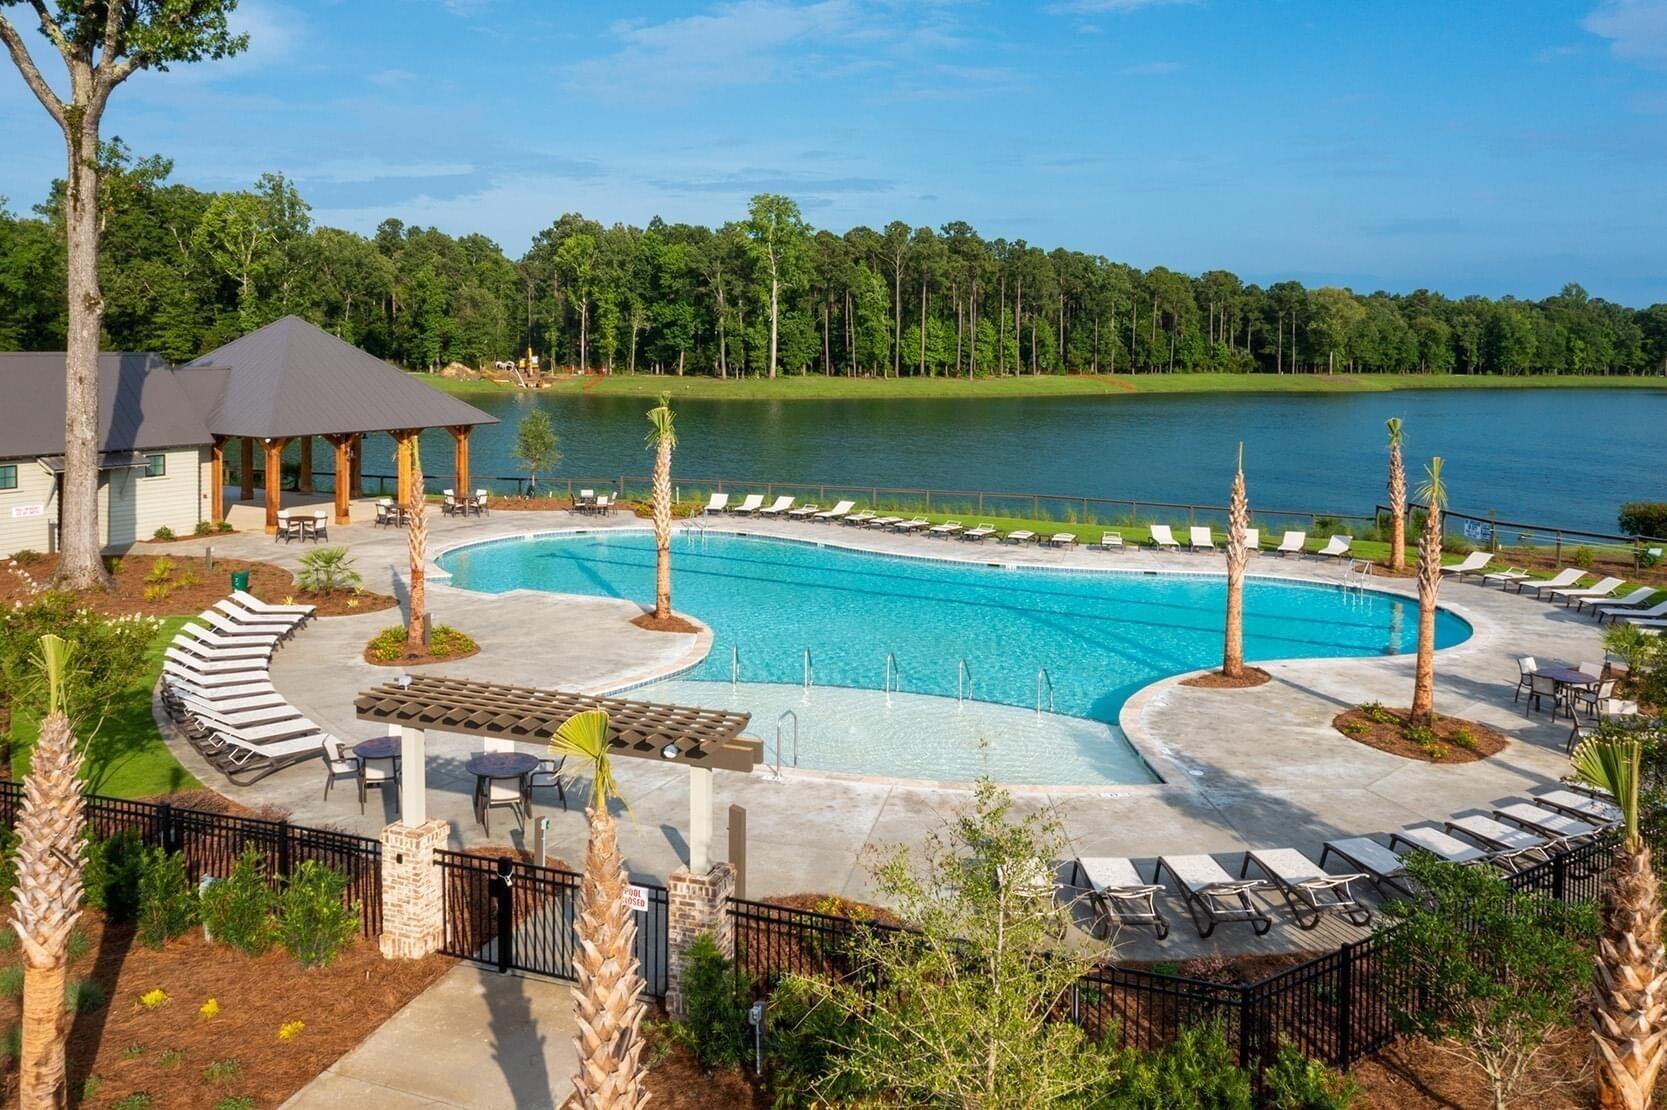 Carolina Park Homes For Sale - 3855 Segars Landin, Mount Pleasant, SC - 9